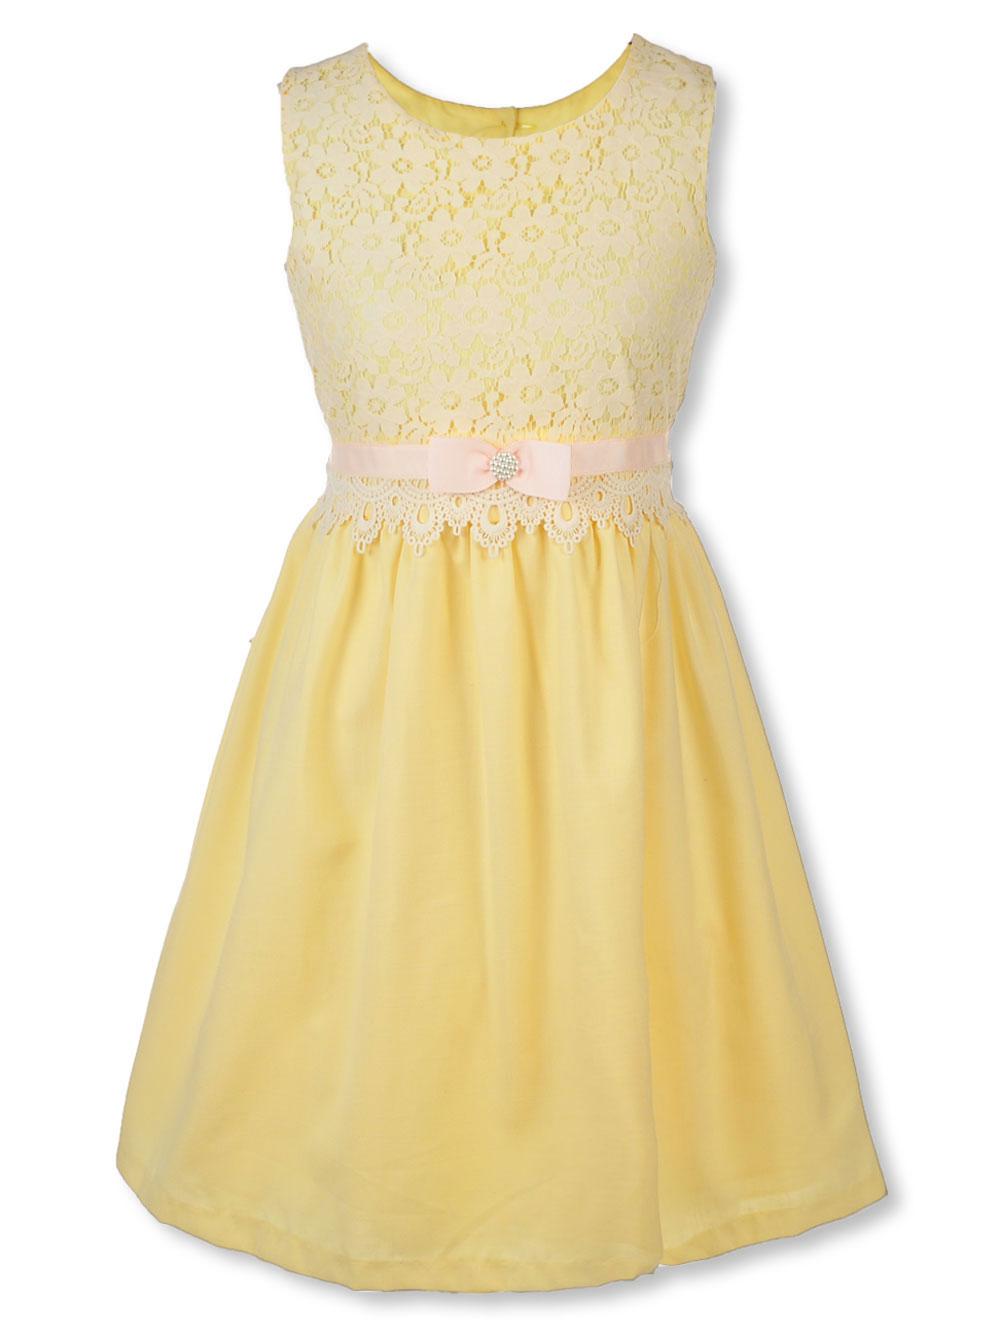 Big Girls\' Plus Size Dress by Bonnie Jean in Yellow